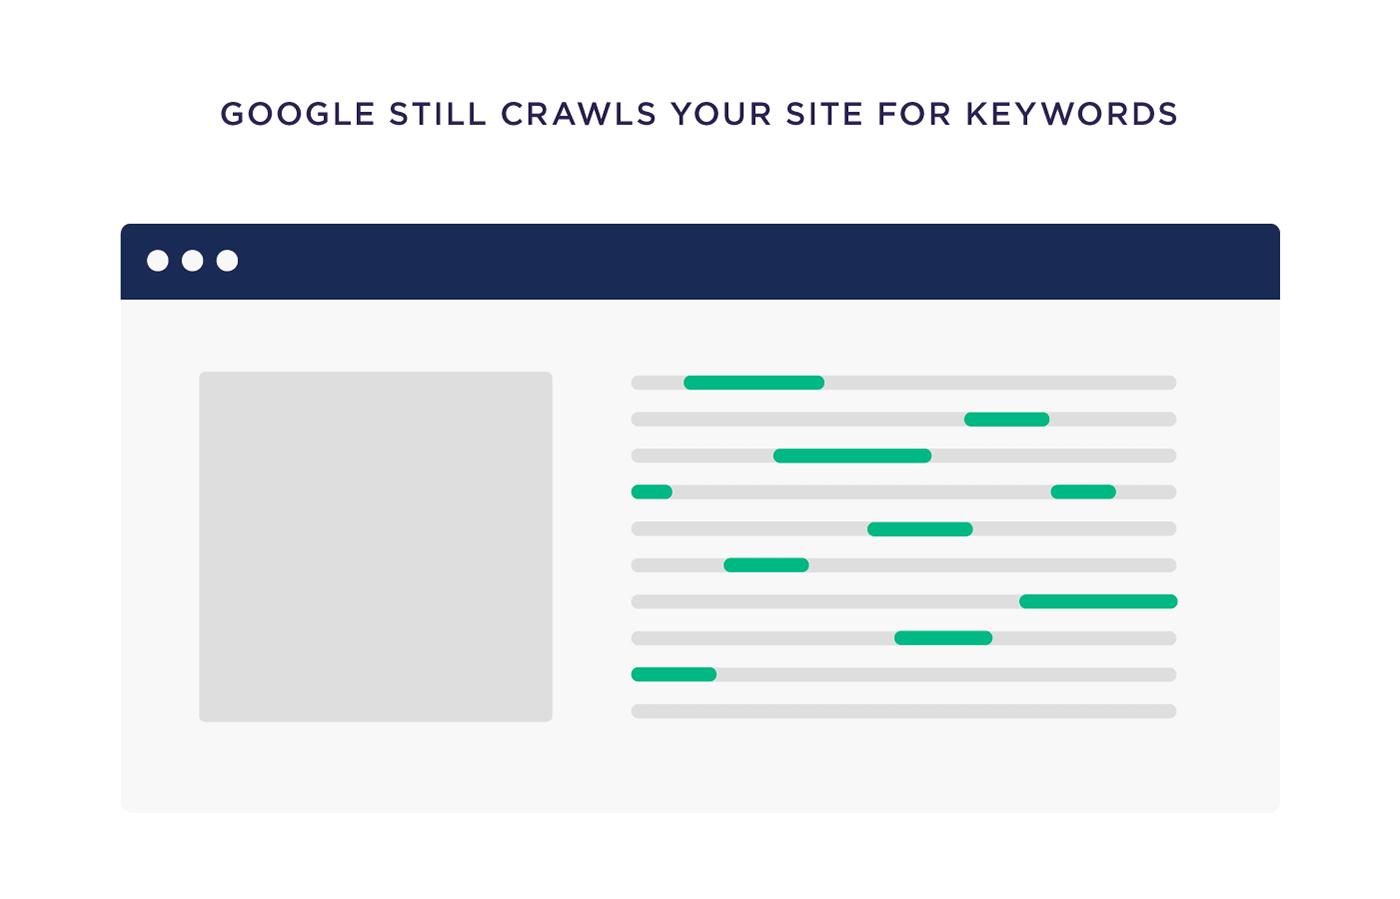 Google still crawls your site for keywords